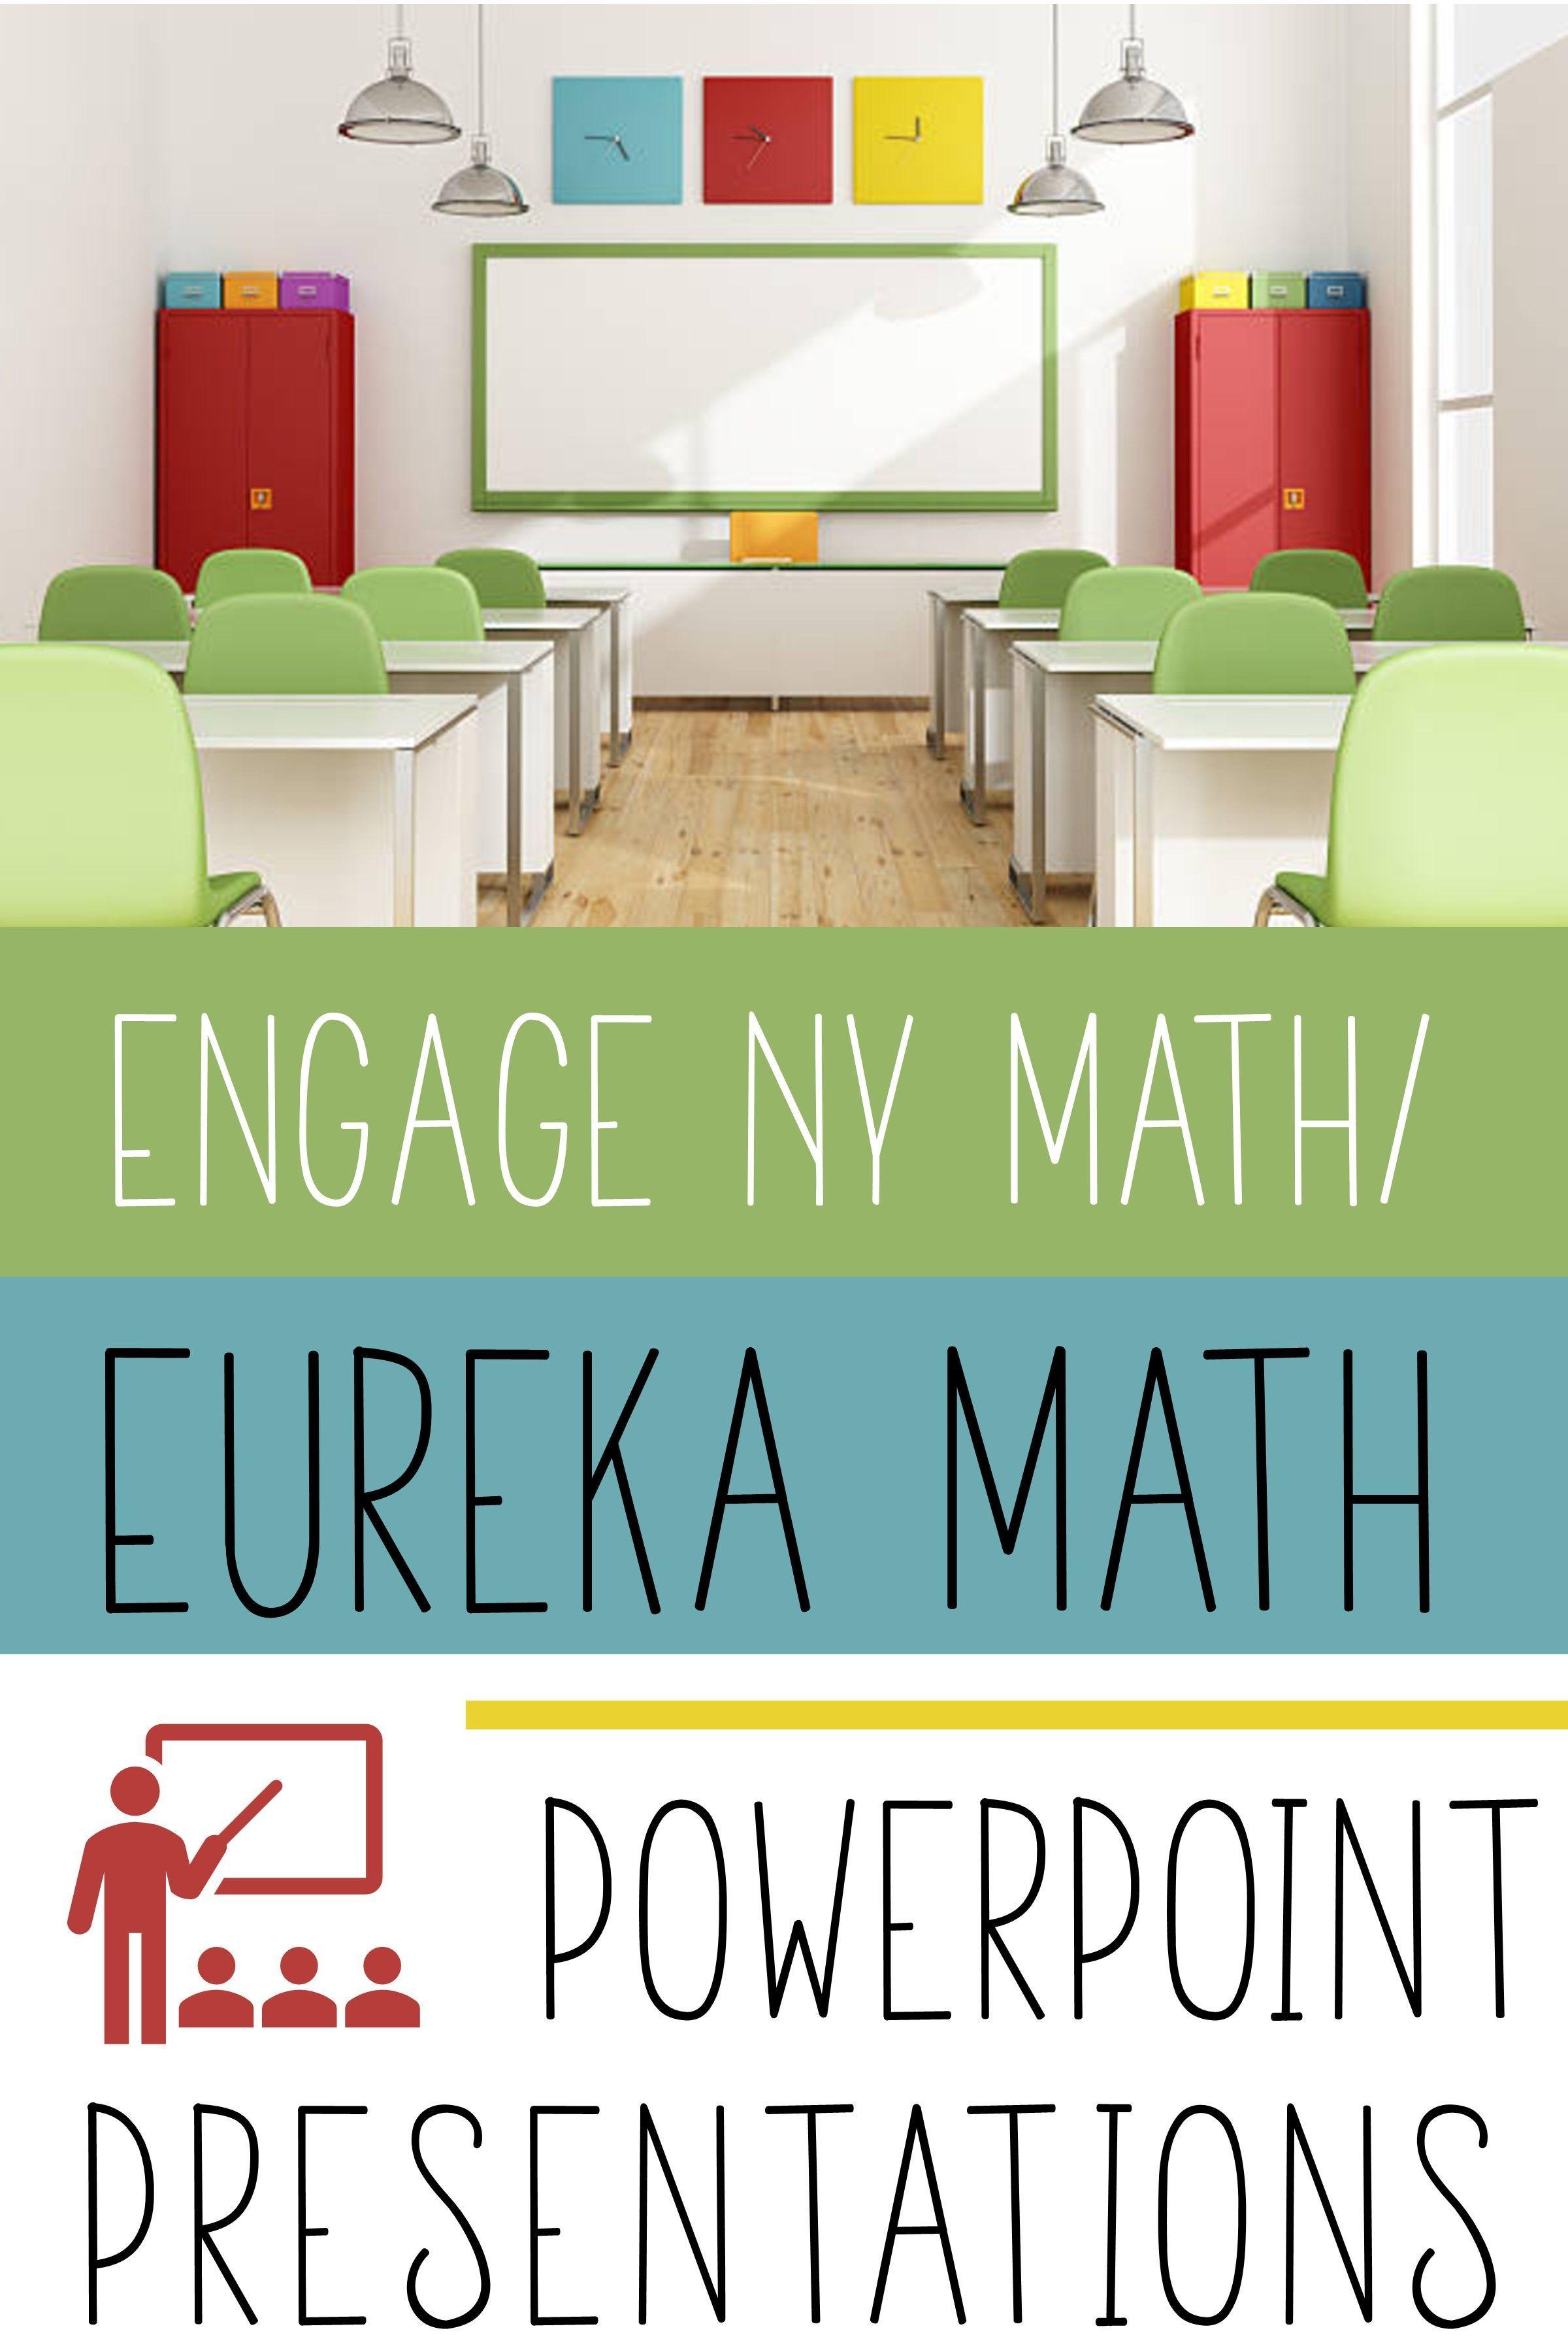 Engage Ny Math A K A Eureka Math Powerpoint